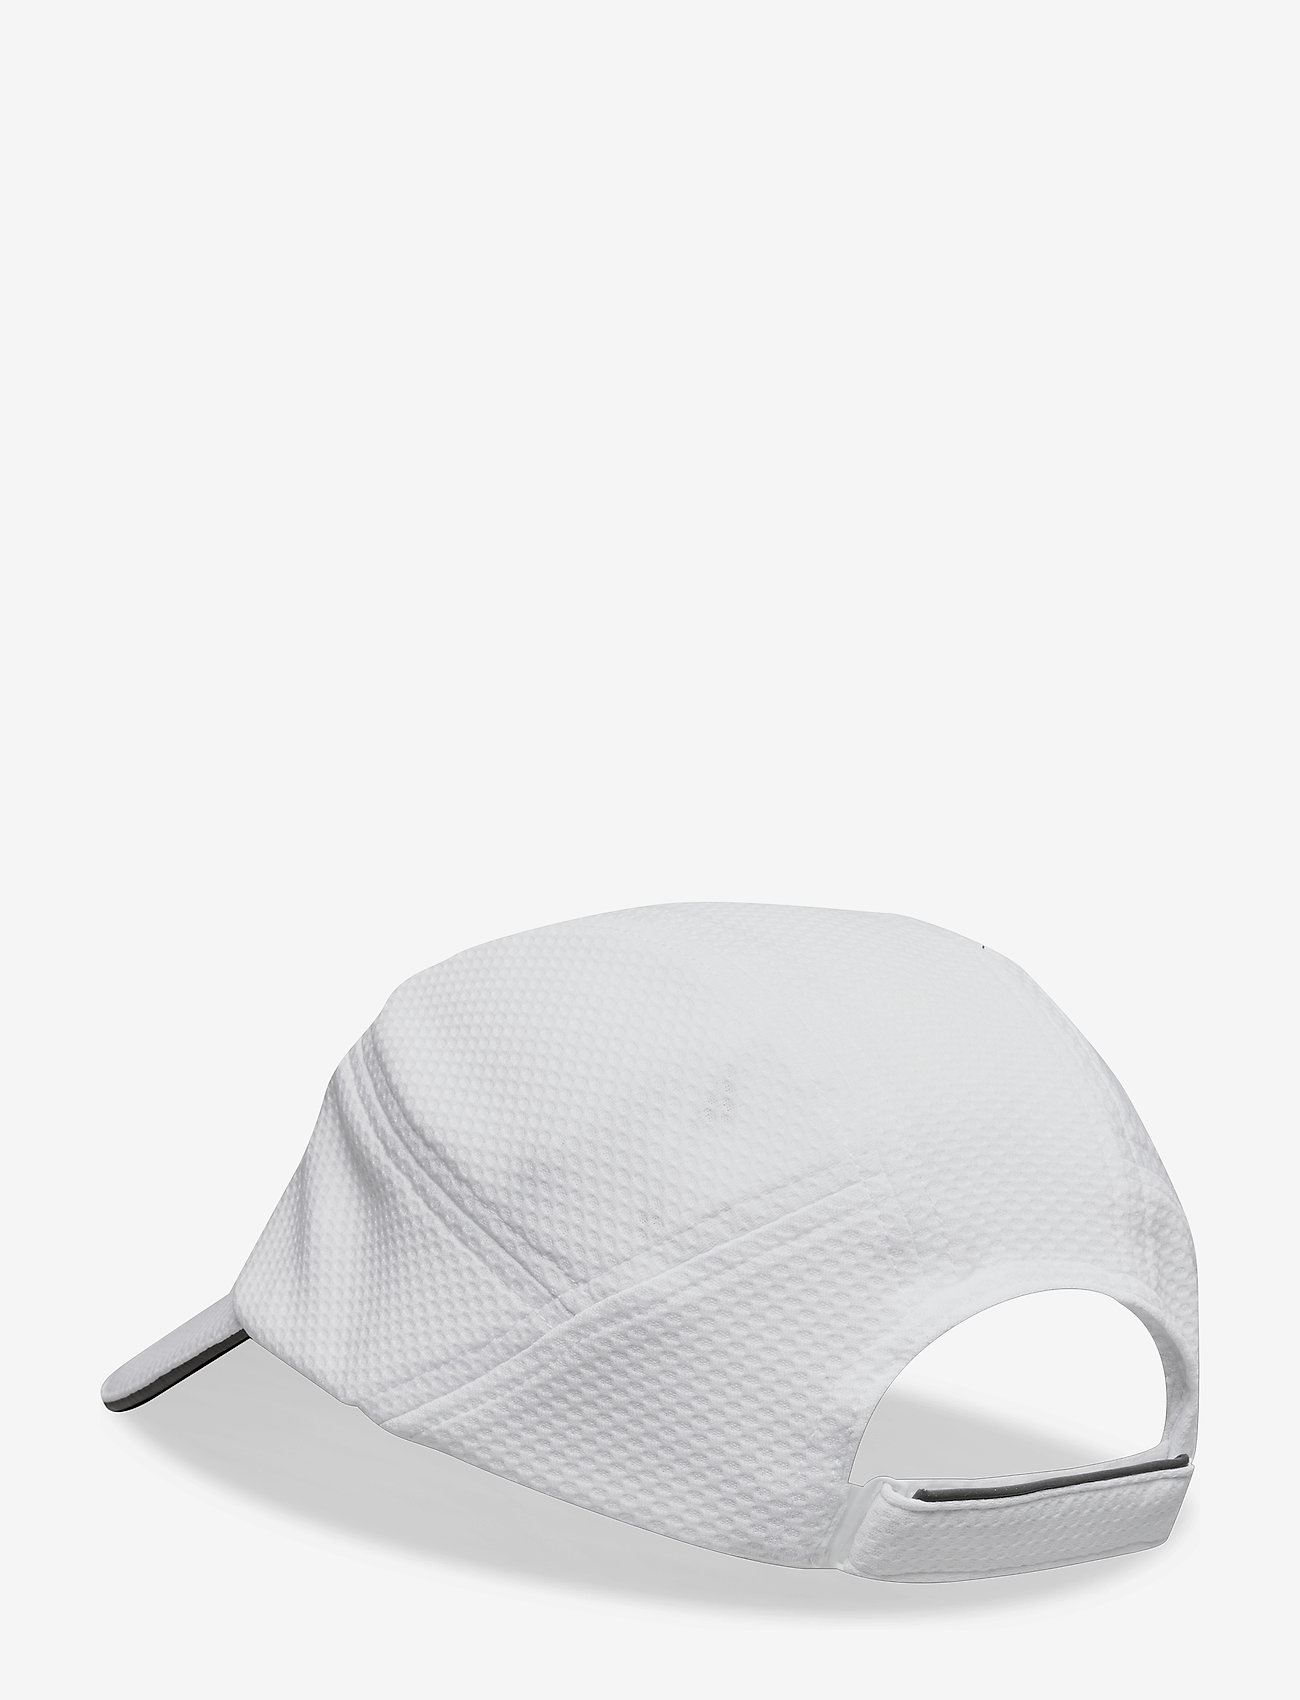 Craft - RUN CAP WHITE ONE SIZE FLUMINO  - accessories - white - 1